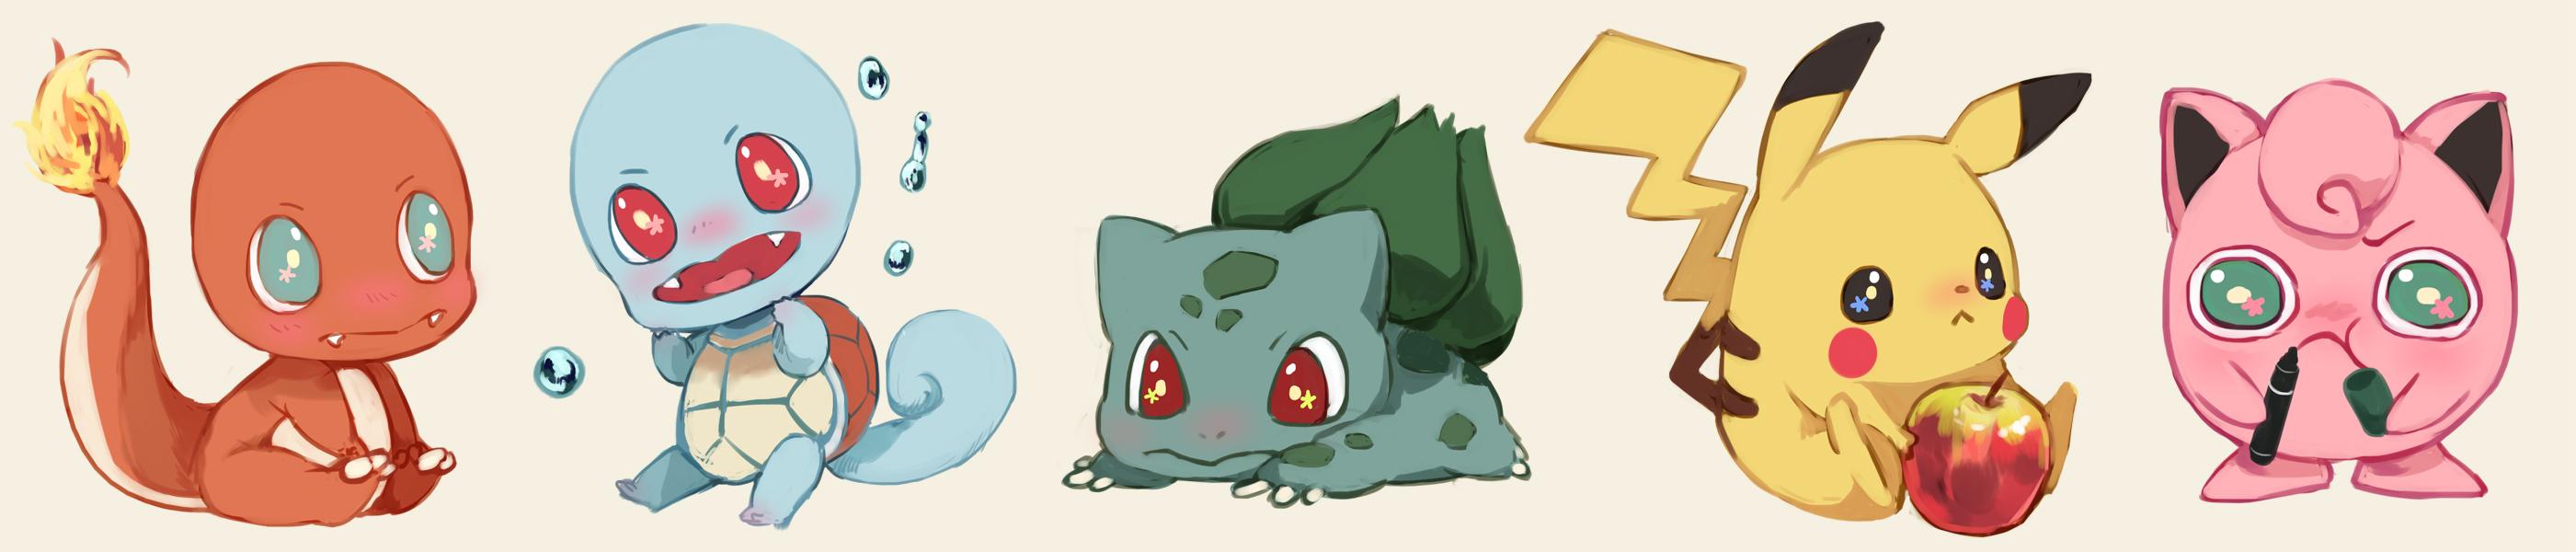 Pokémon Image #1431792 - Zerochan Anime Image Board